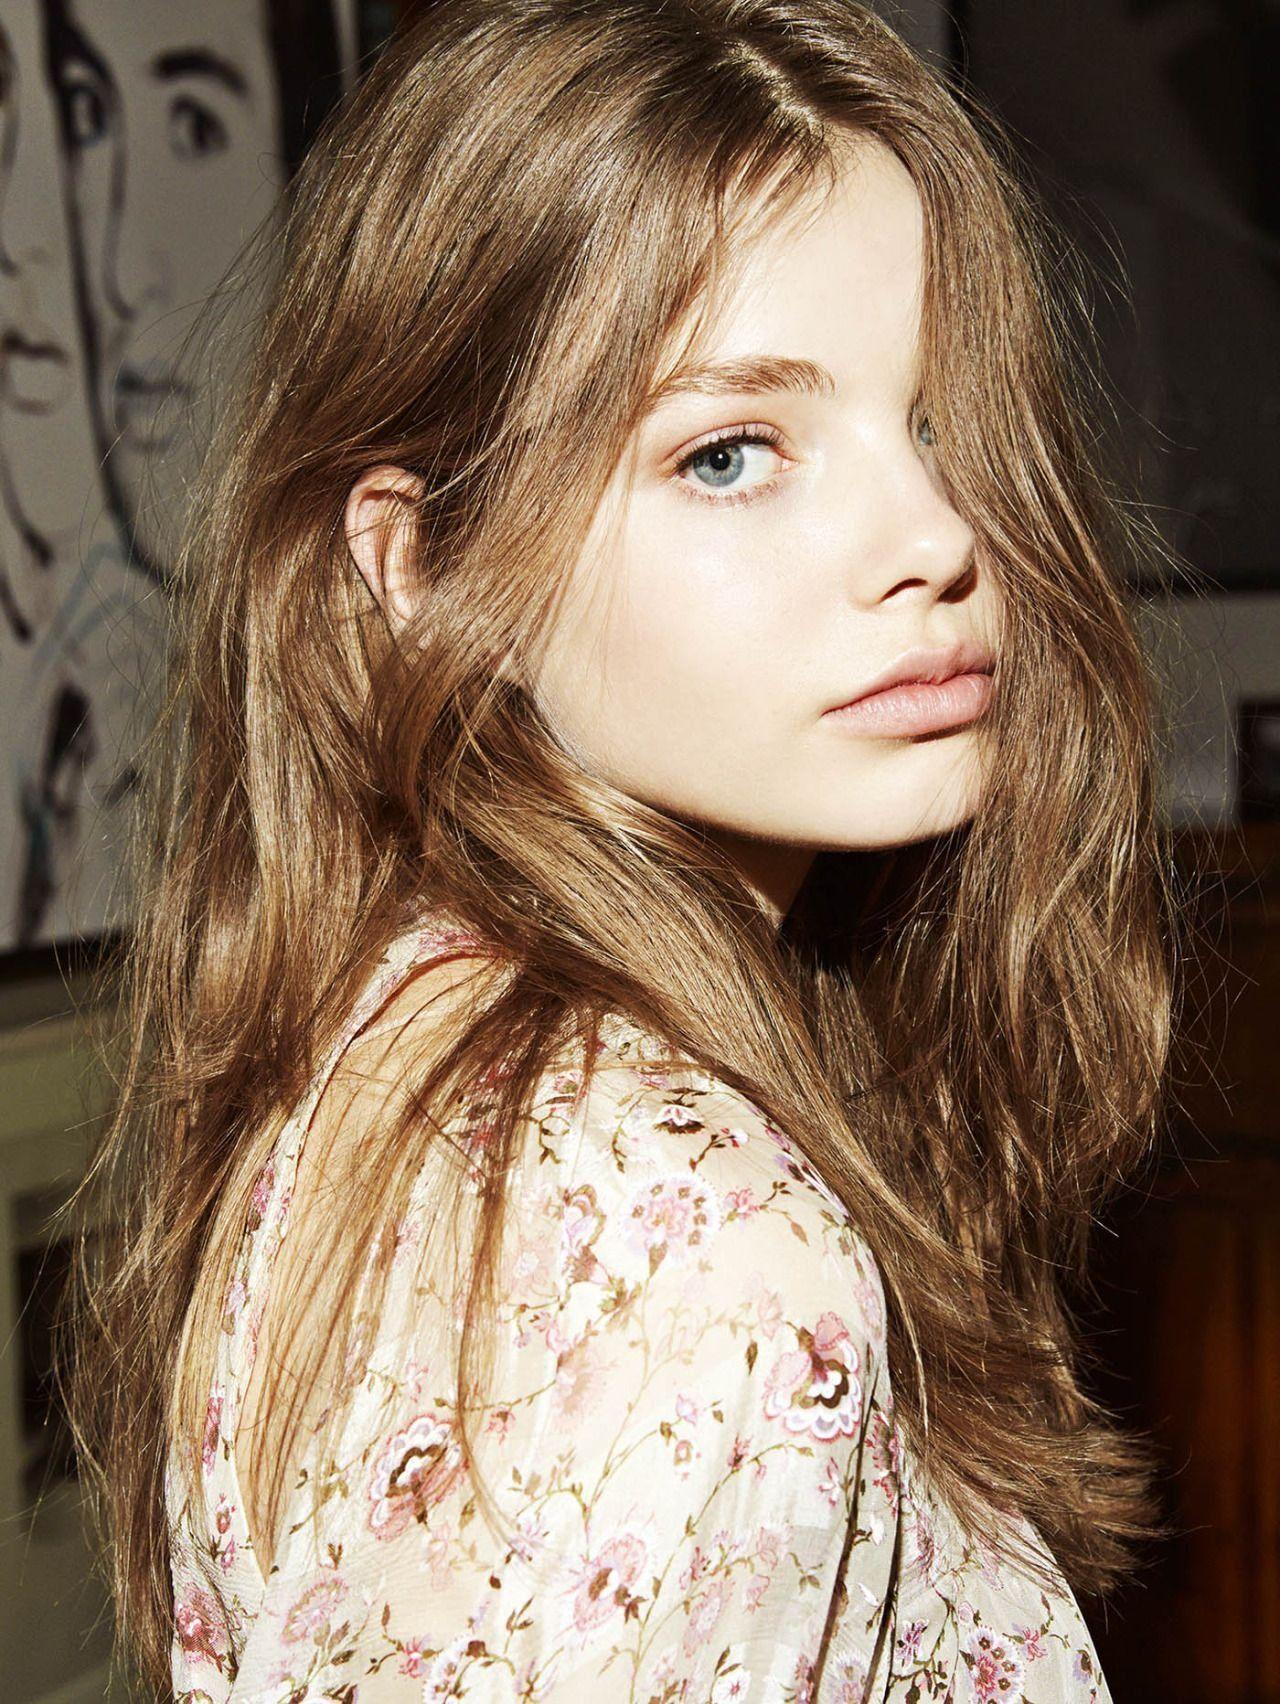 Kristine Froseth #prettygirls | Rosto feminino, Cabelo, Garotas